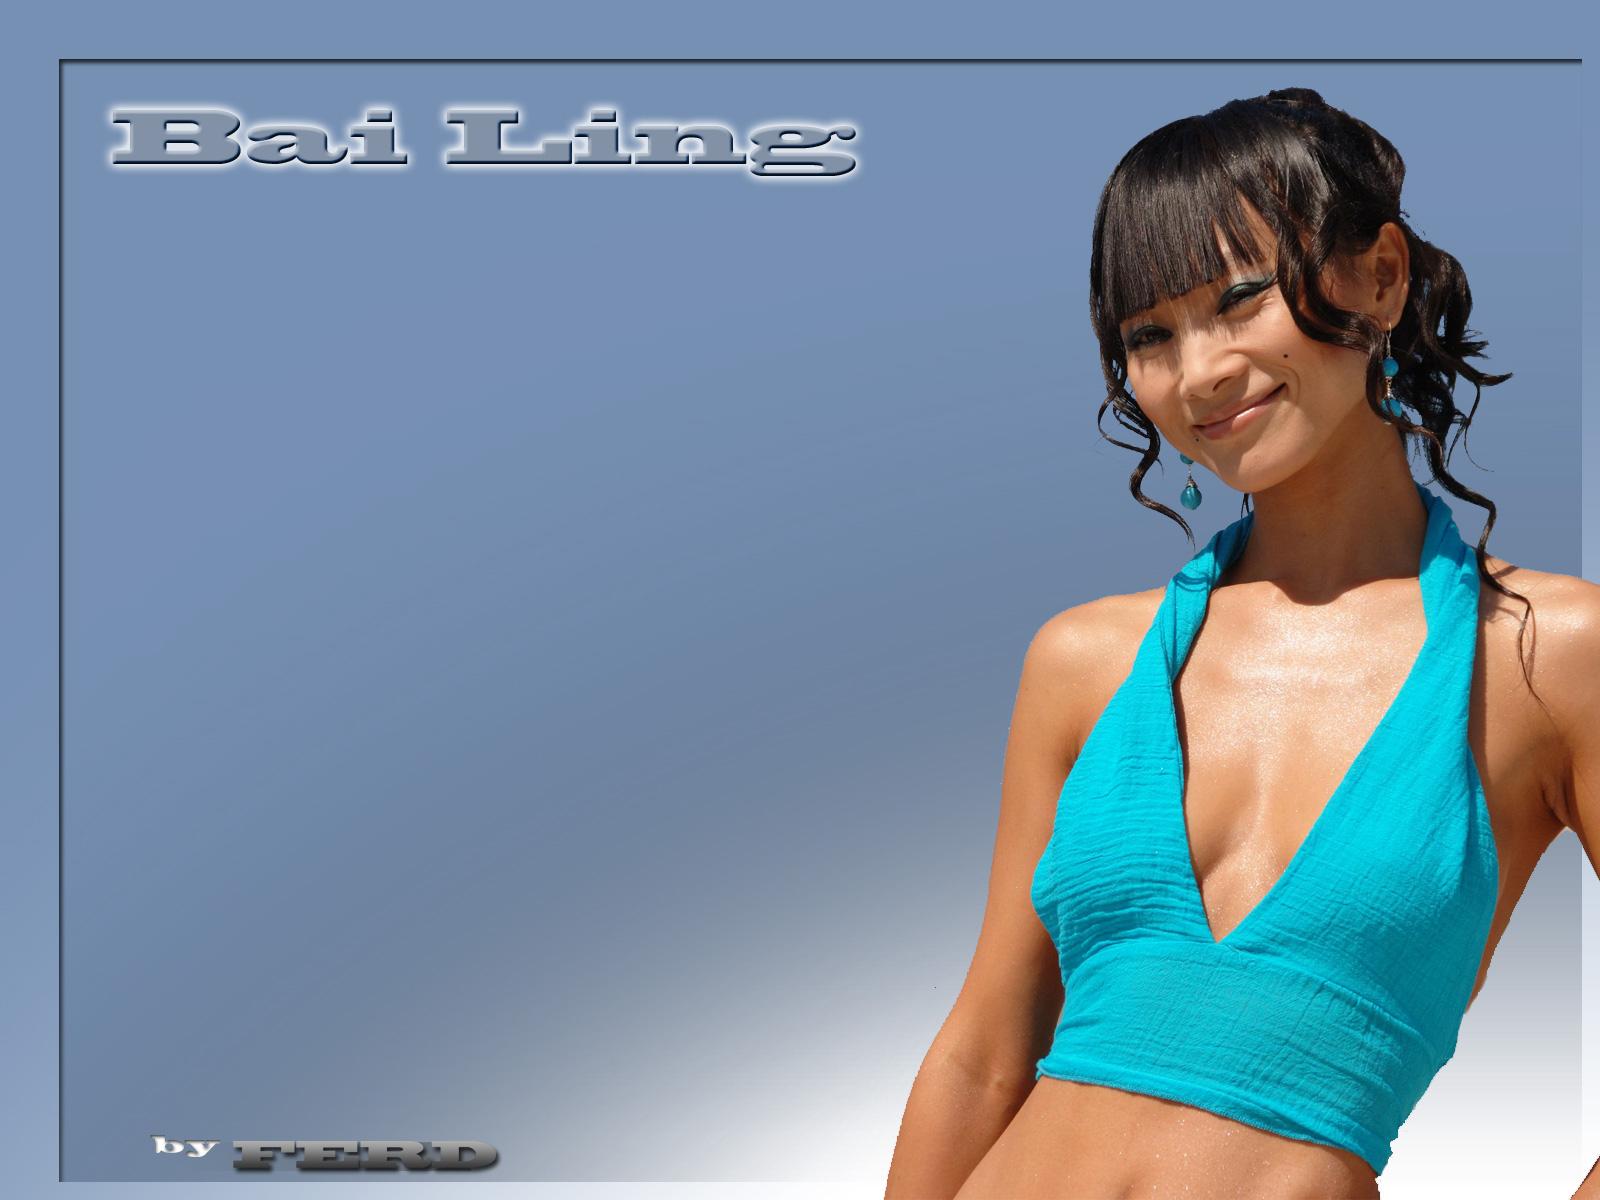 http://1.bp.blogspot.com/-EmF0rj9DvhA/TjTi9AuFdaI/AAAAAAAAC5k/ZOdoOrUlPck/s1600/Bai+Ling+Hairstyle+%25285%2529.jpg